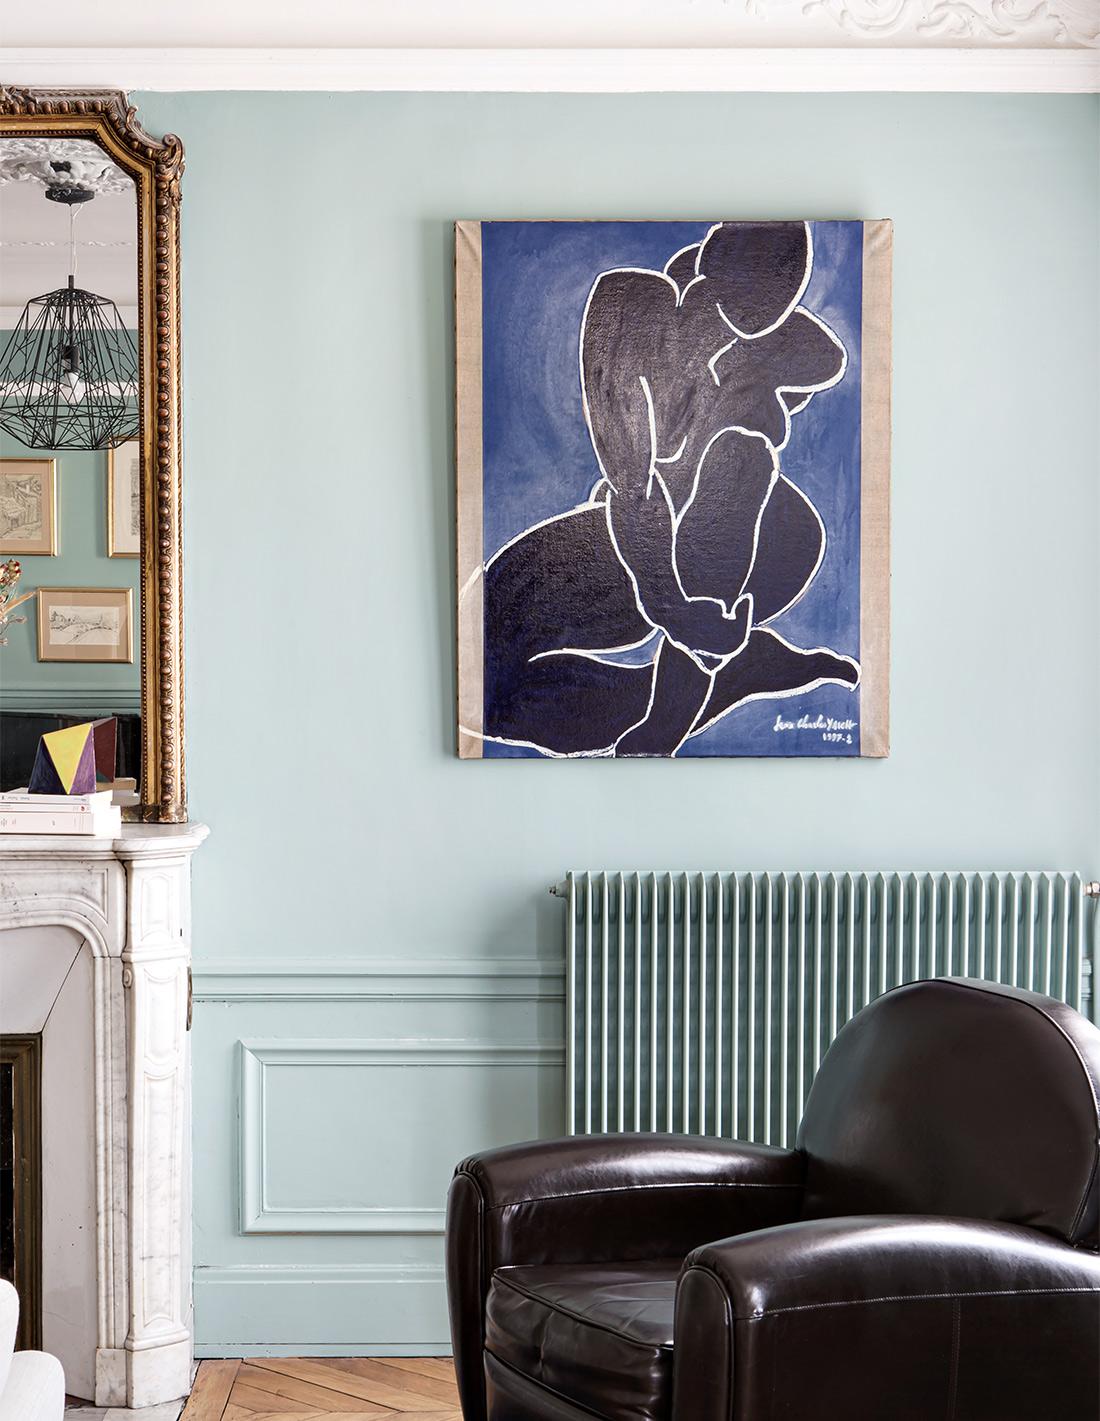 Wilovers Estelle & Romain - Peinture Jean-Charles Yaïch